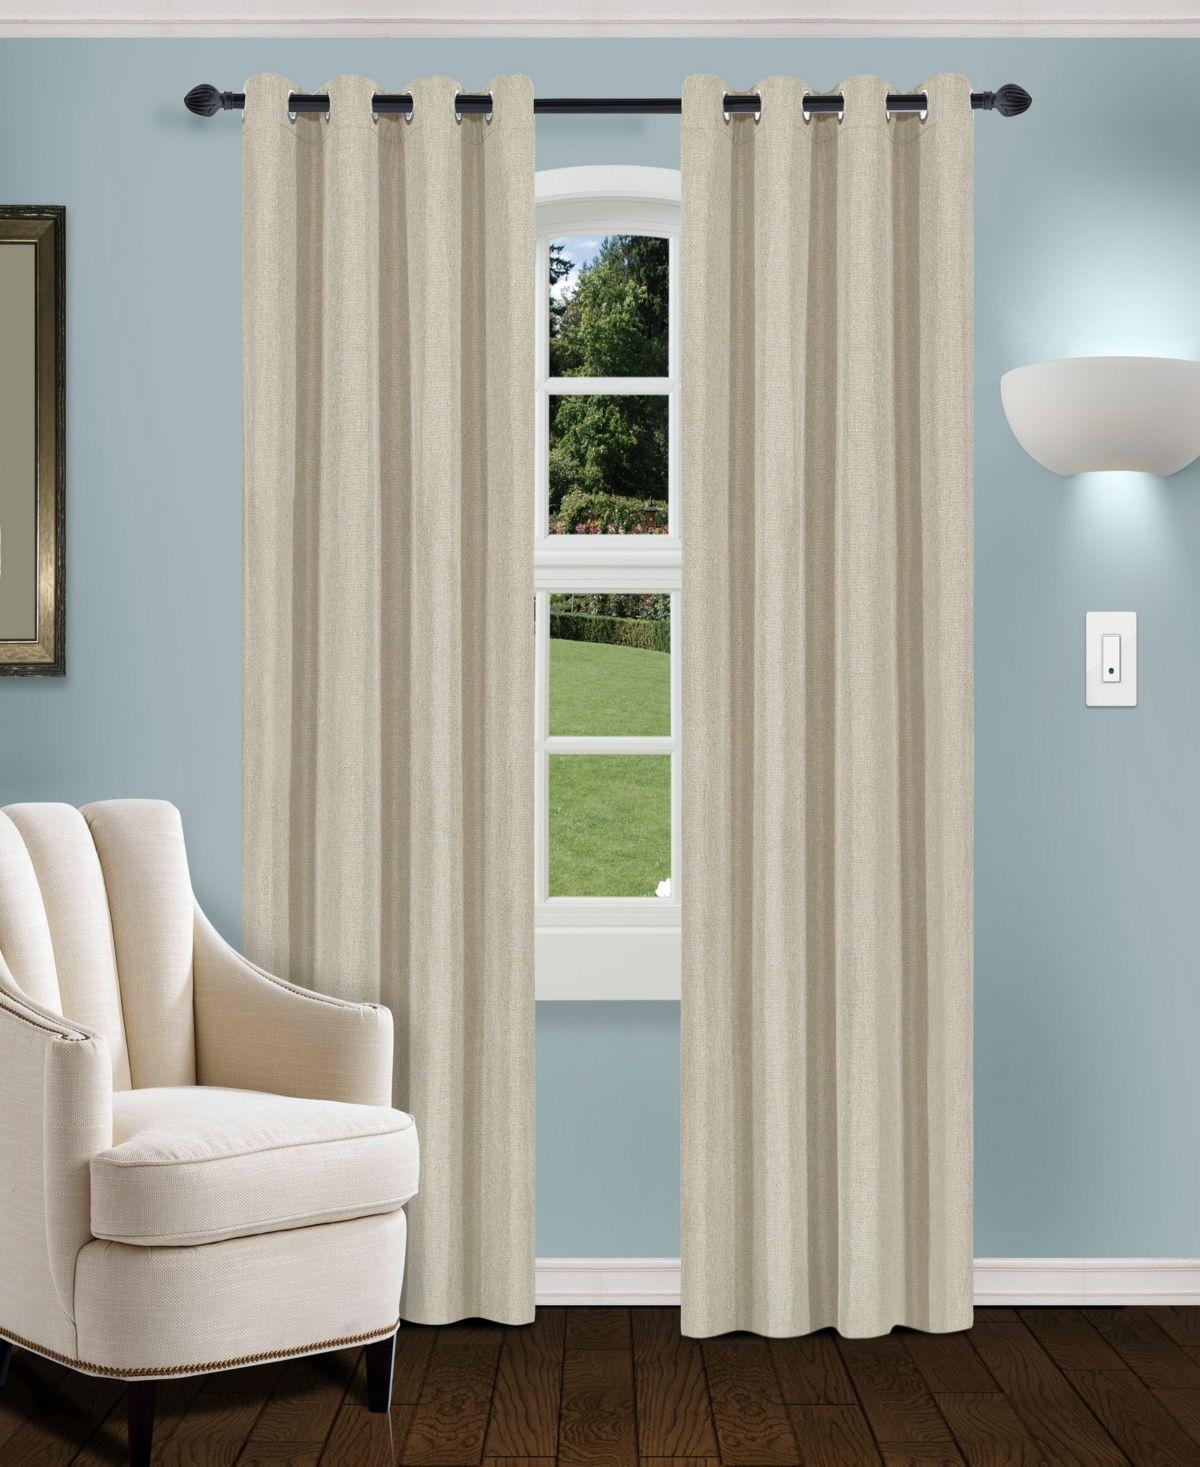 Superior Linen Textured Blackout Curtain Set Of 2 52 X 108